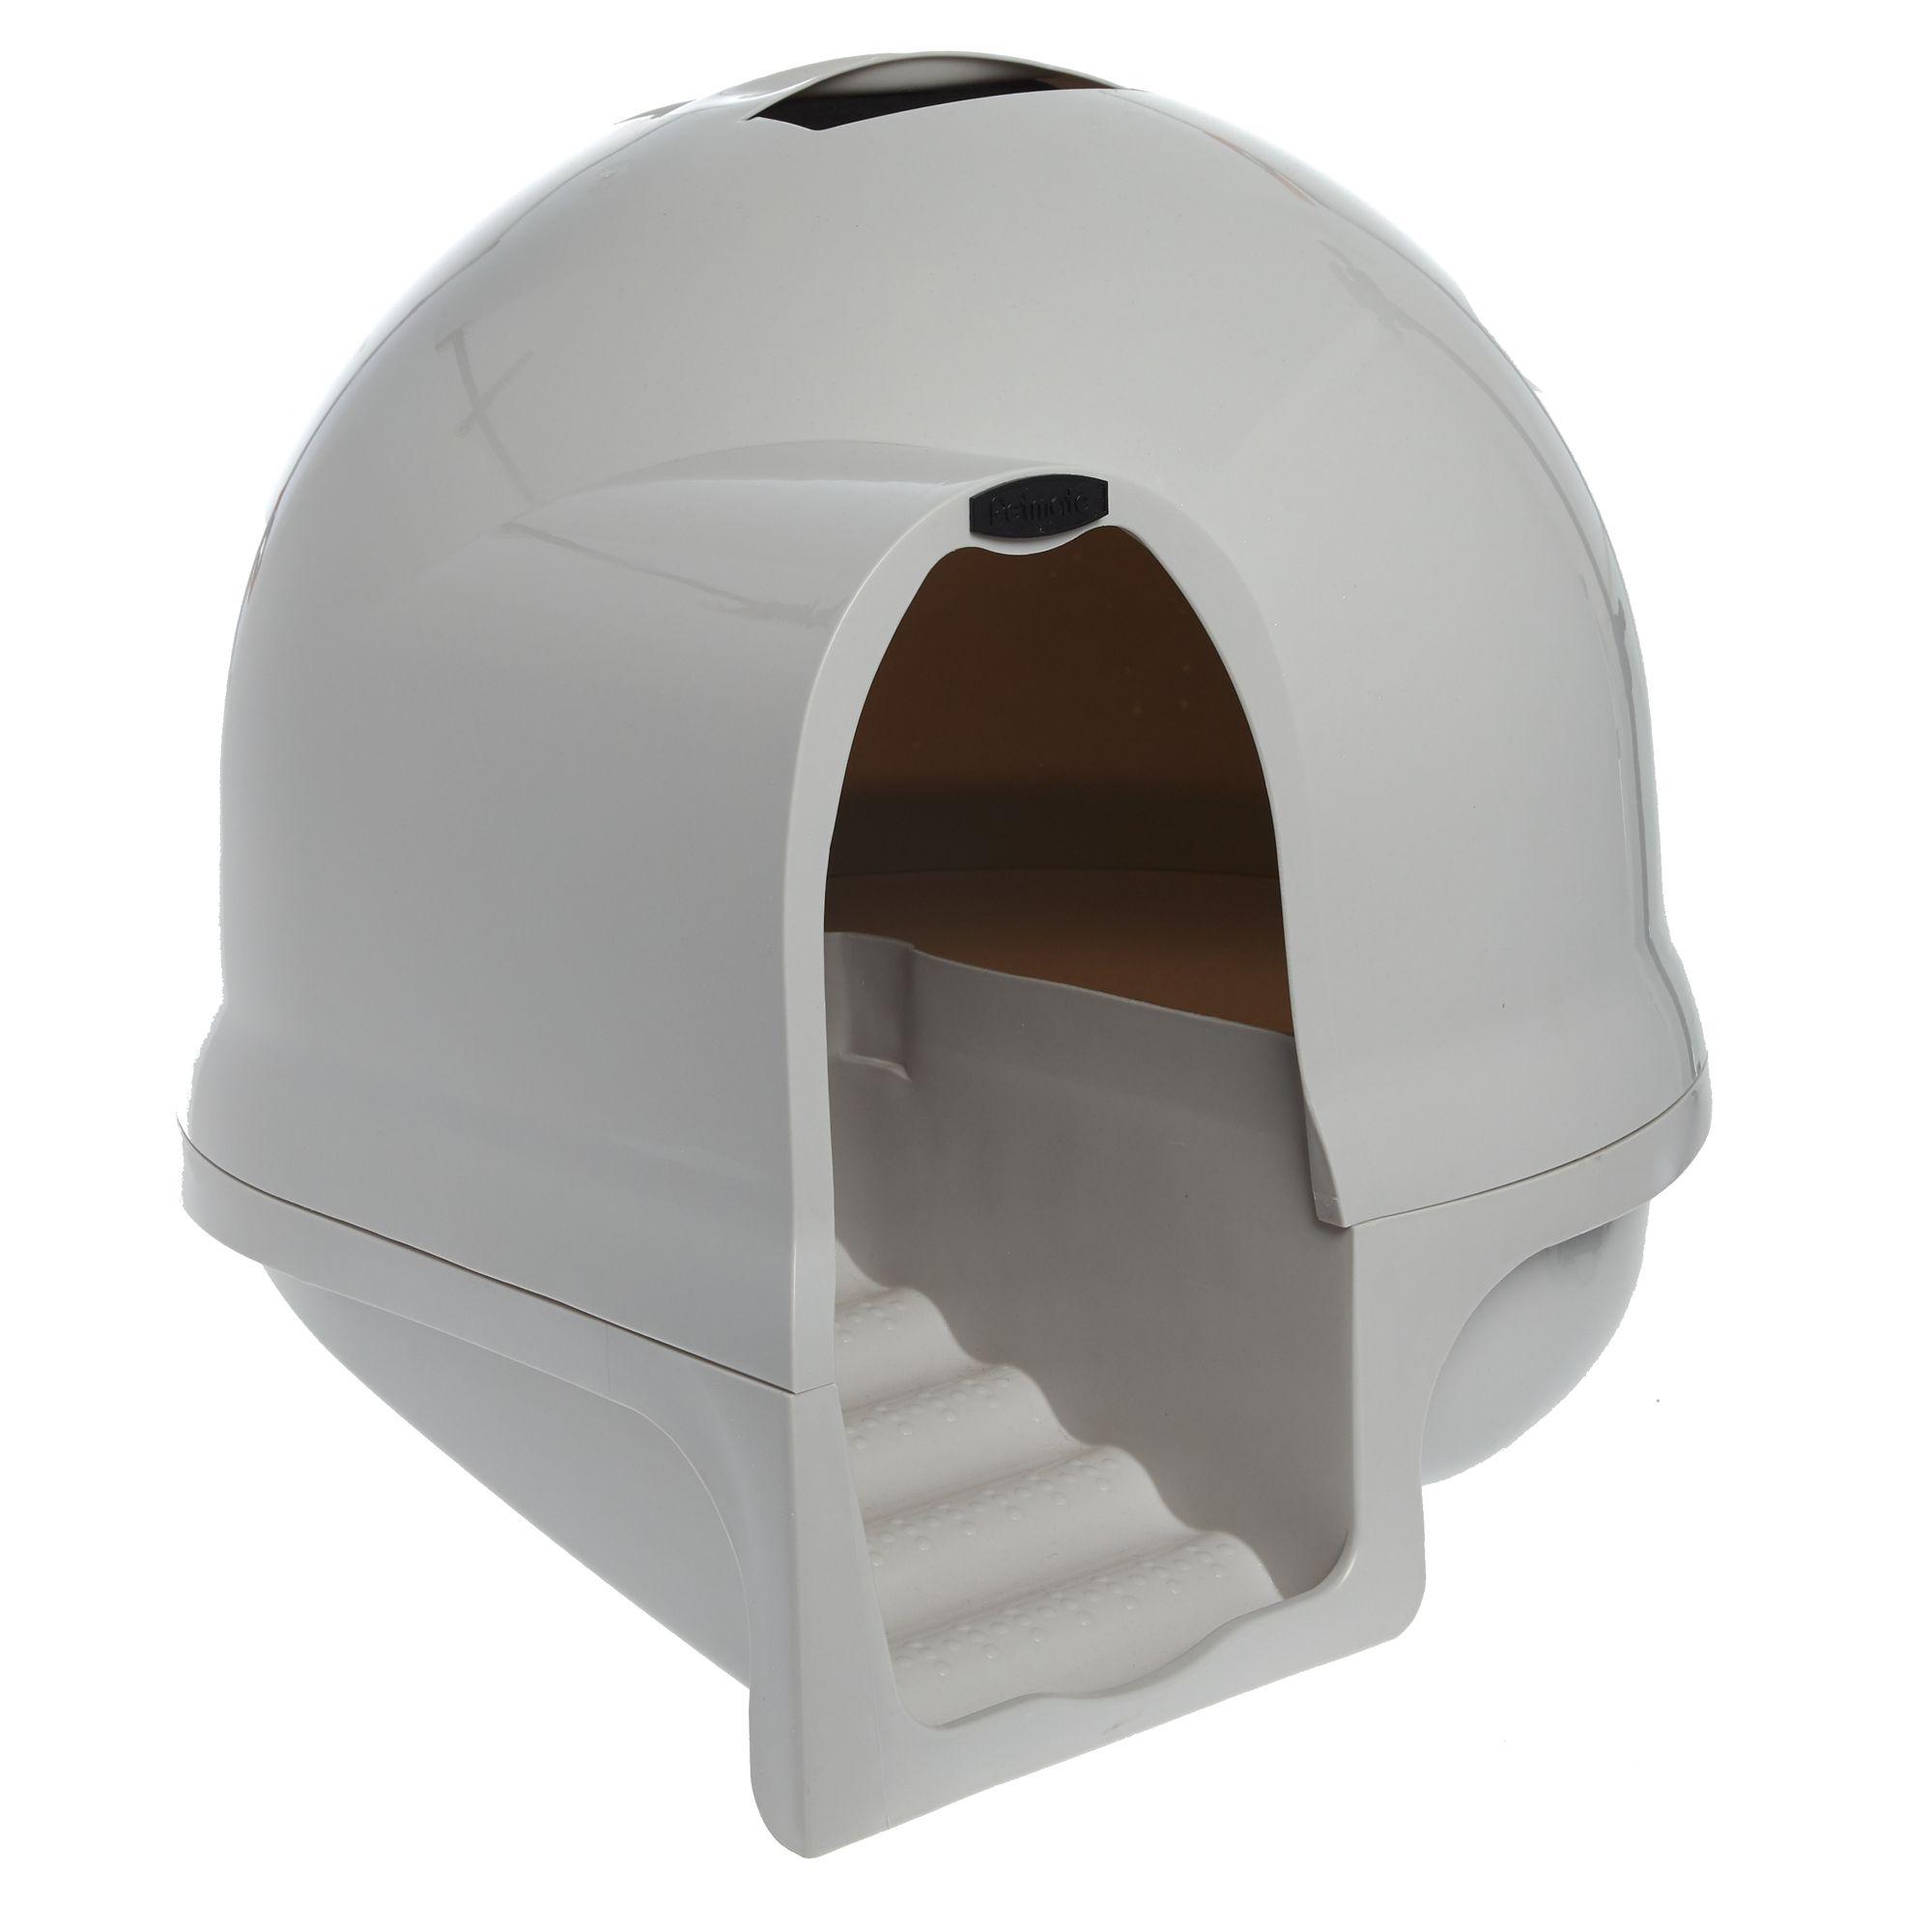 Petmate Booda Clean Step Litter Box cat Litter Boxes PetSmart